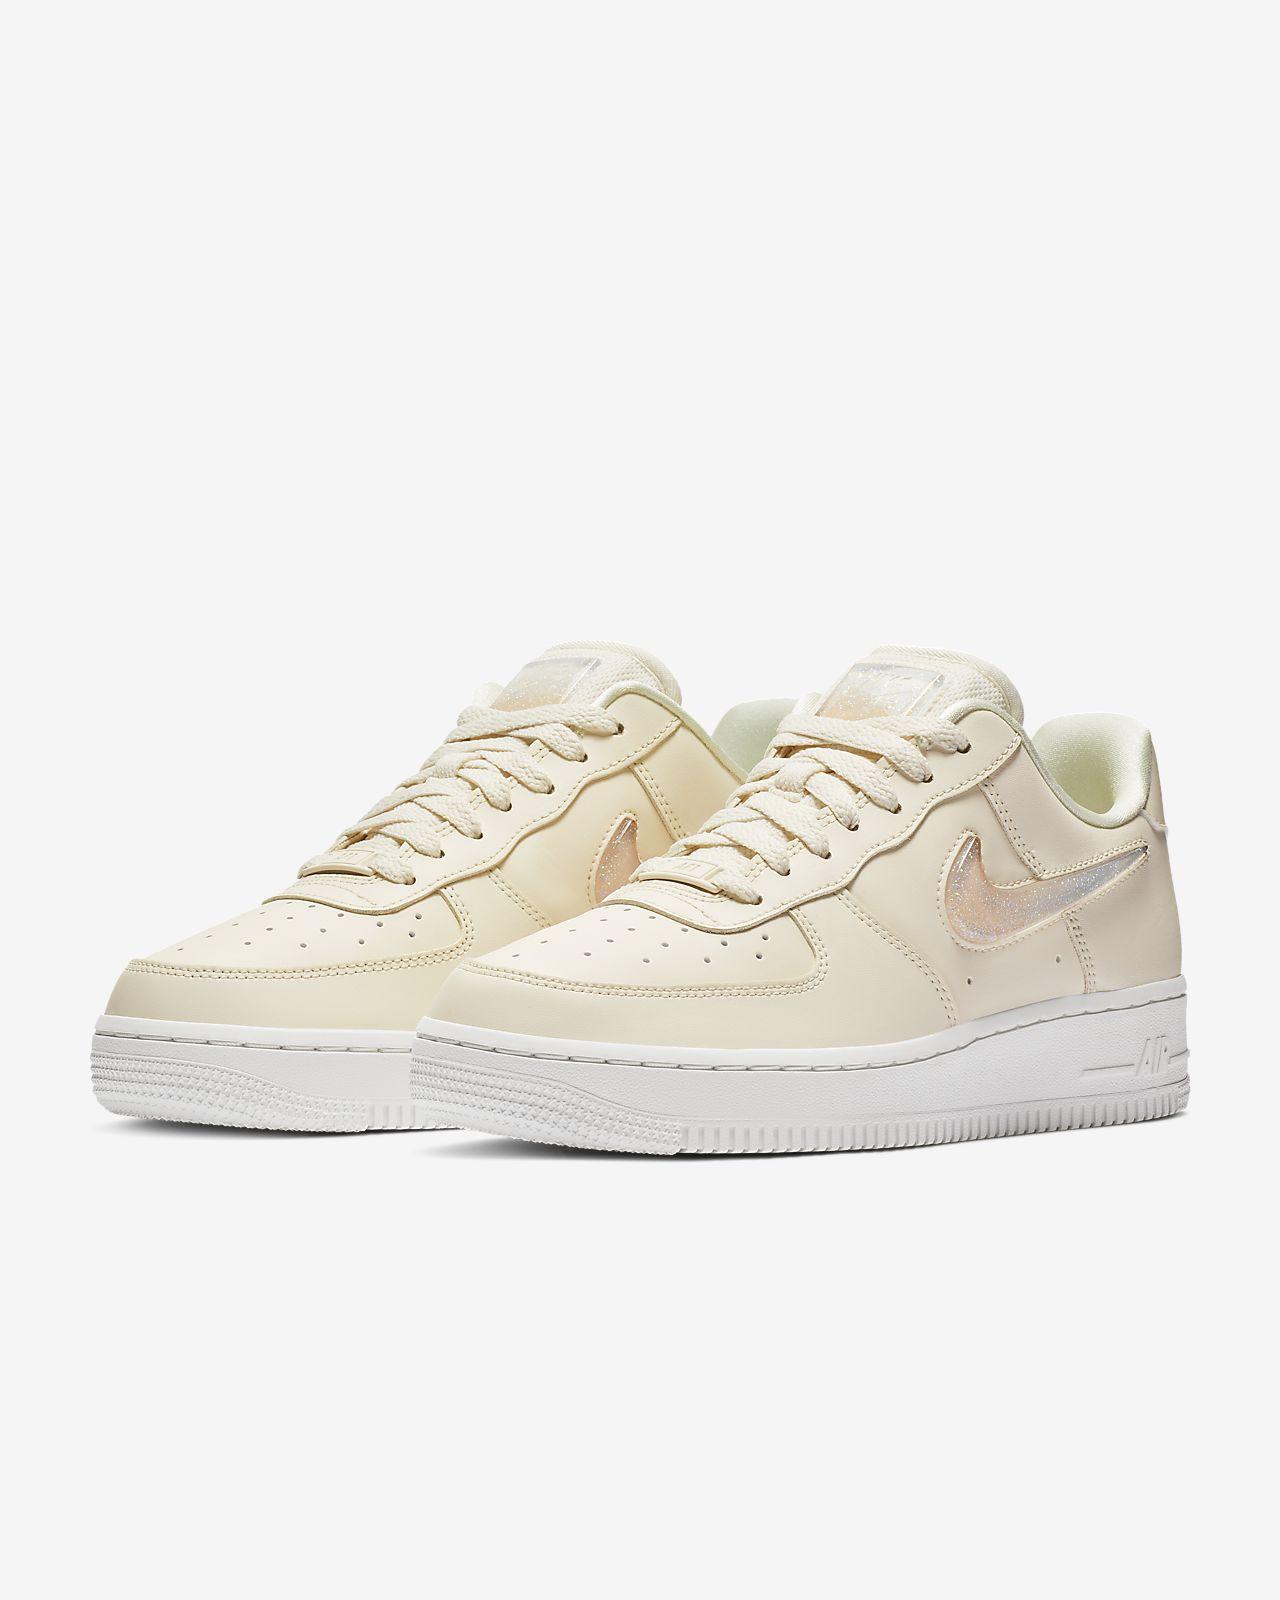 low priced ecb0b 47363 ... Nike Air Force 1 07 SE Premium Womens Shoe